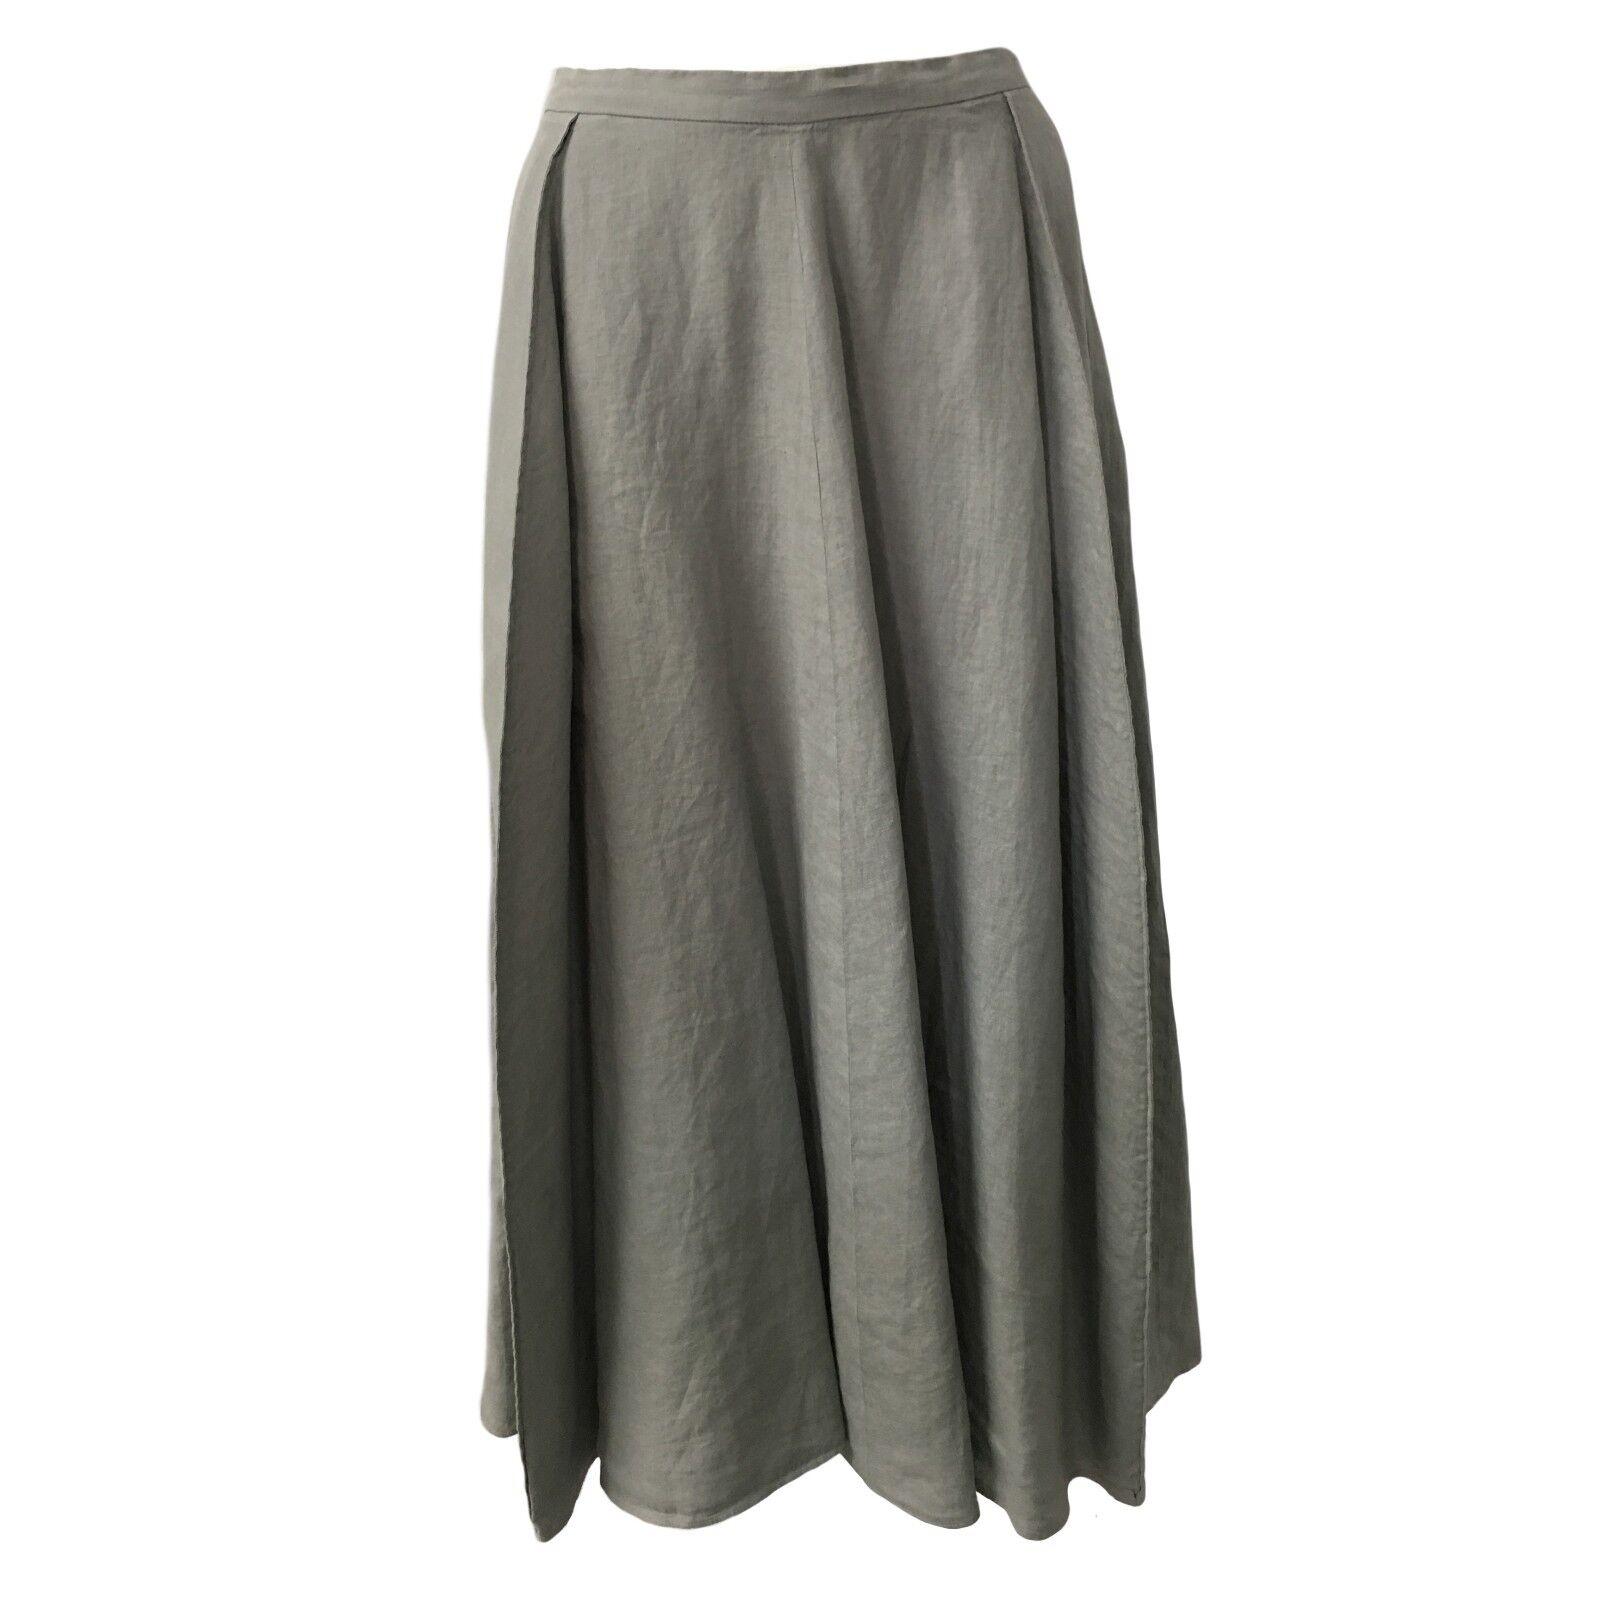 ASPESI kjol kvinna ljus grå Mod h507 c195 100% Linen